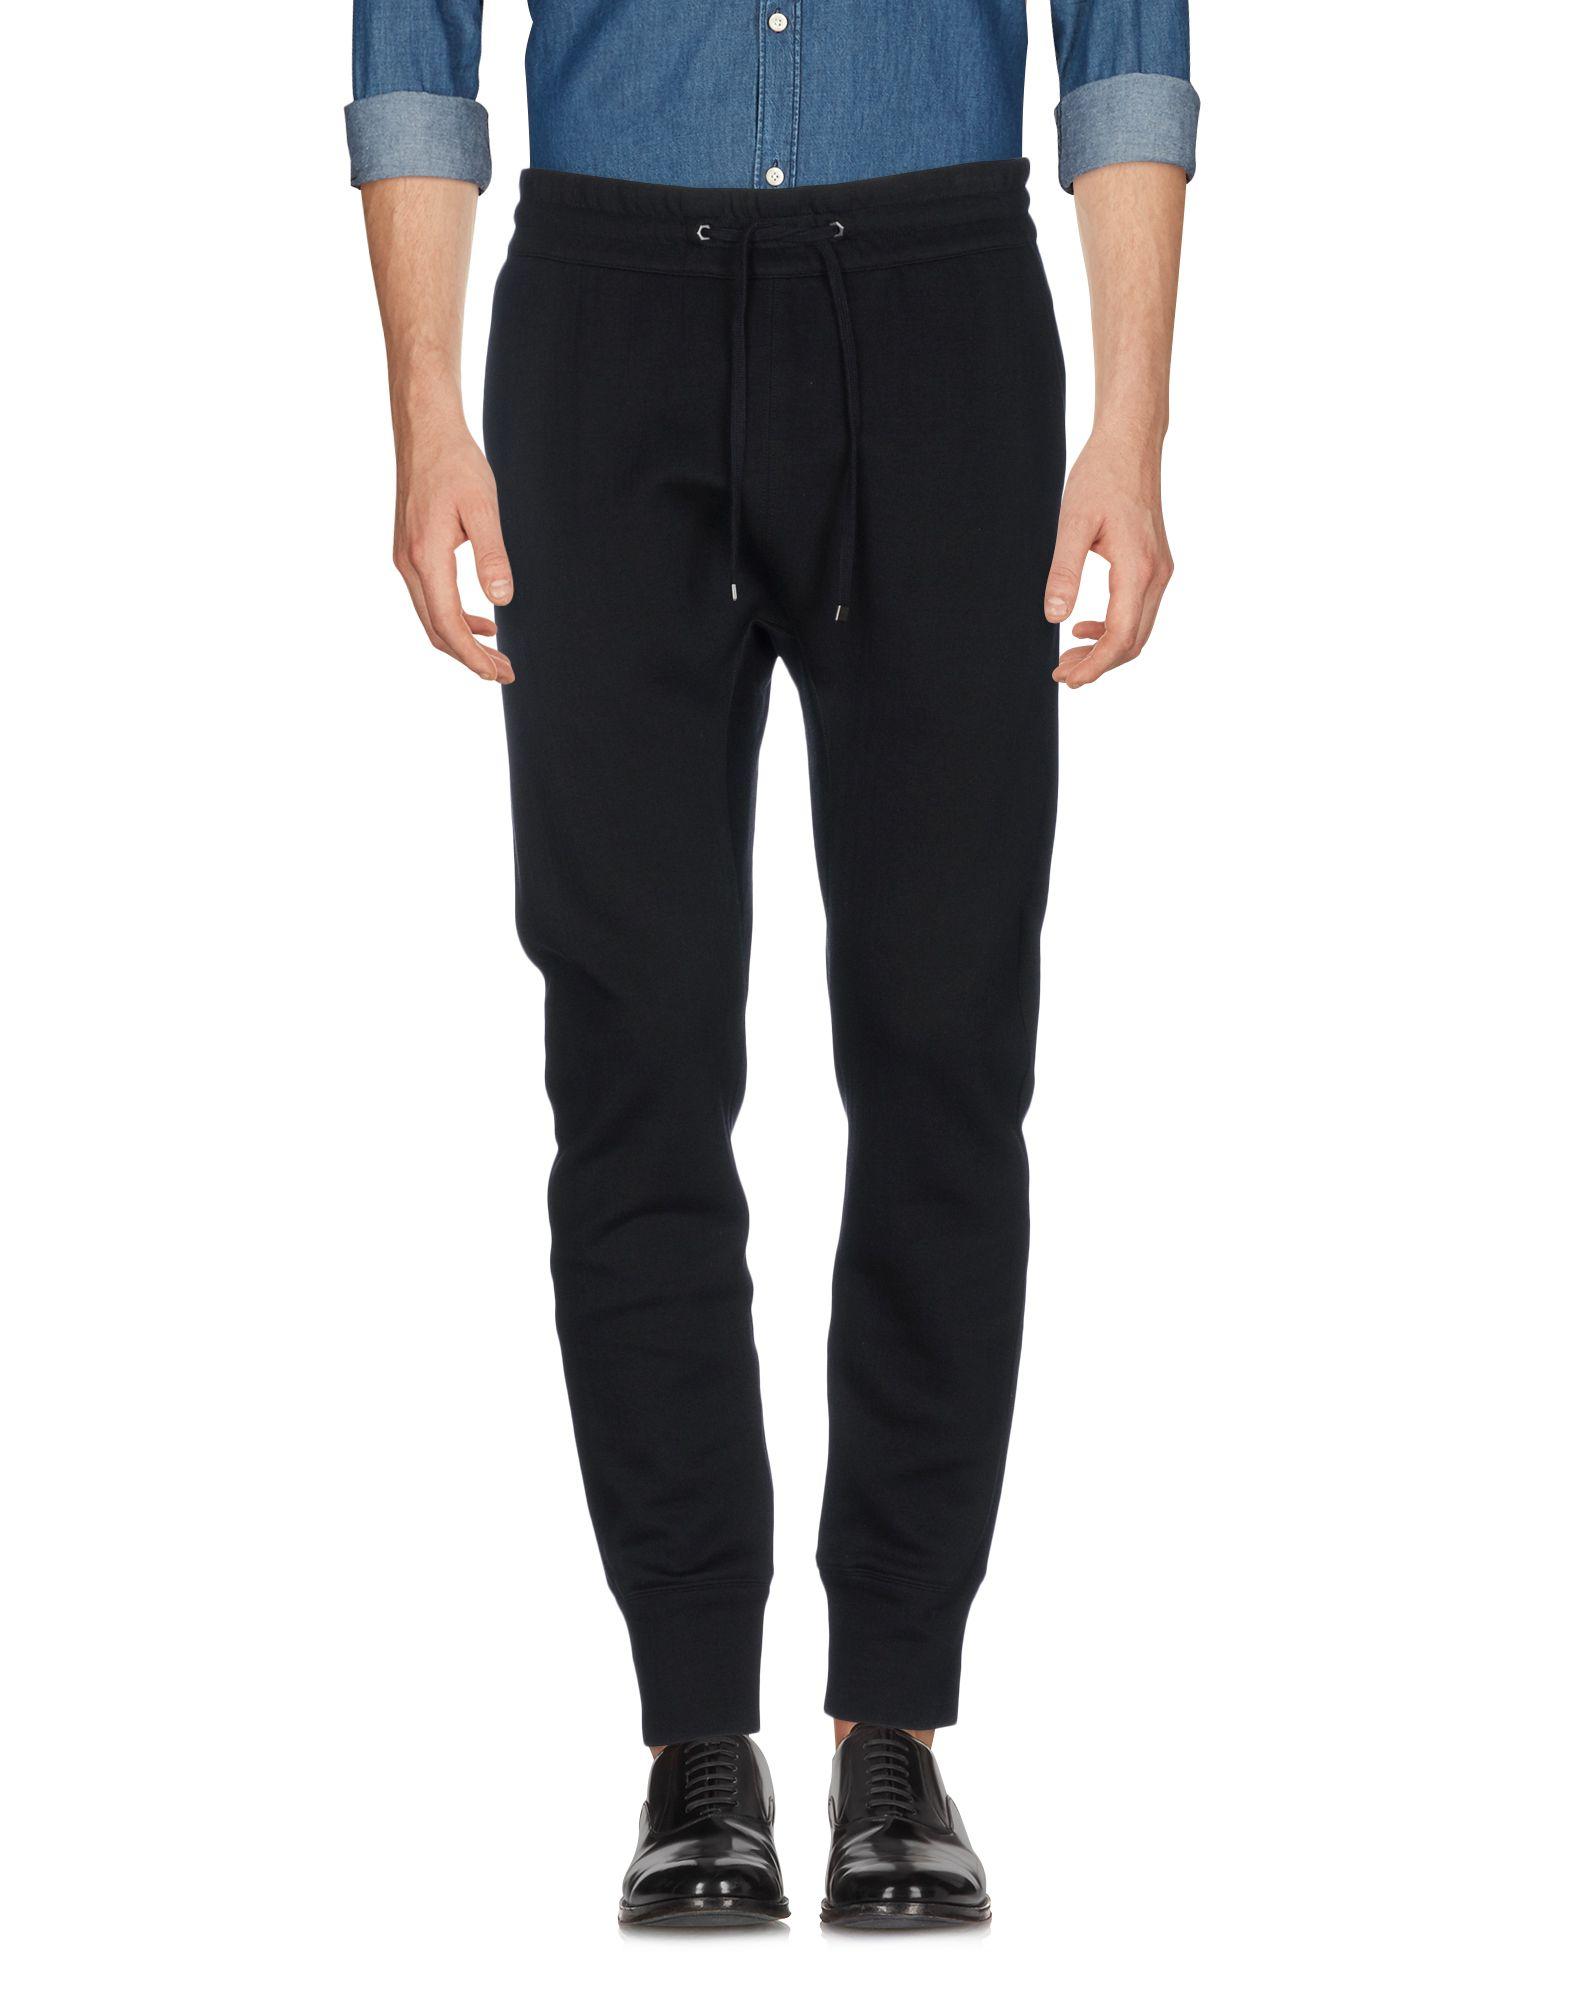 Pantalone Helmut Lang Uomo - Acquista online su